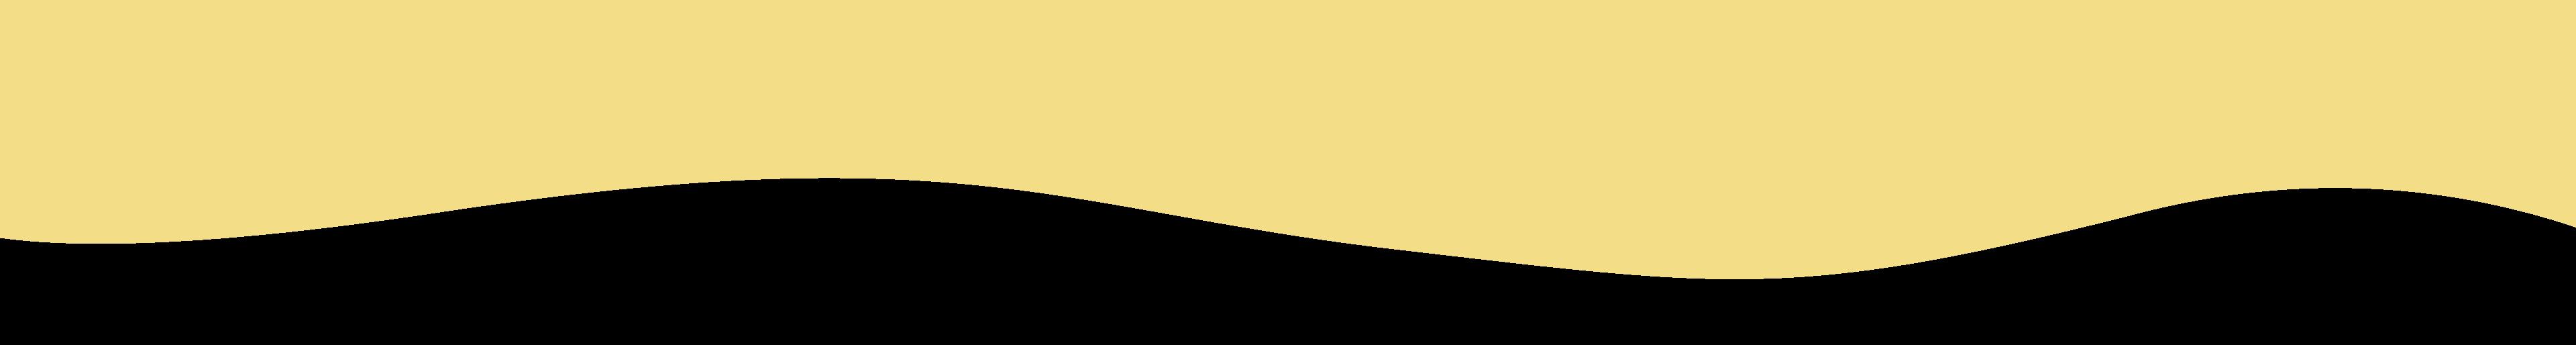 Yellow wave